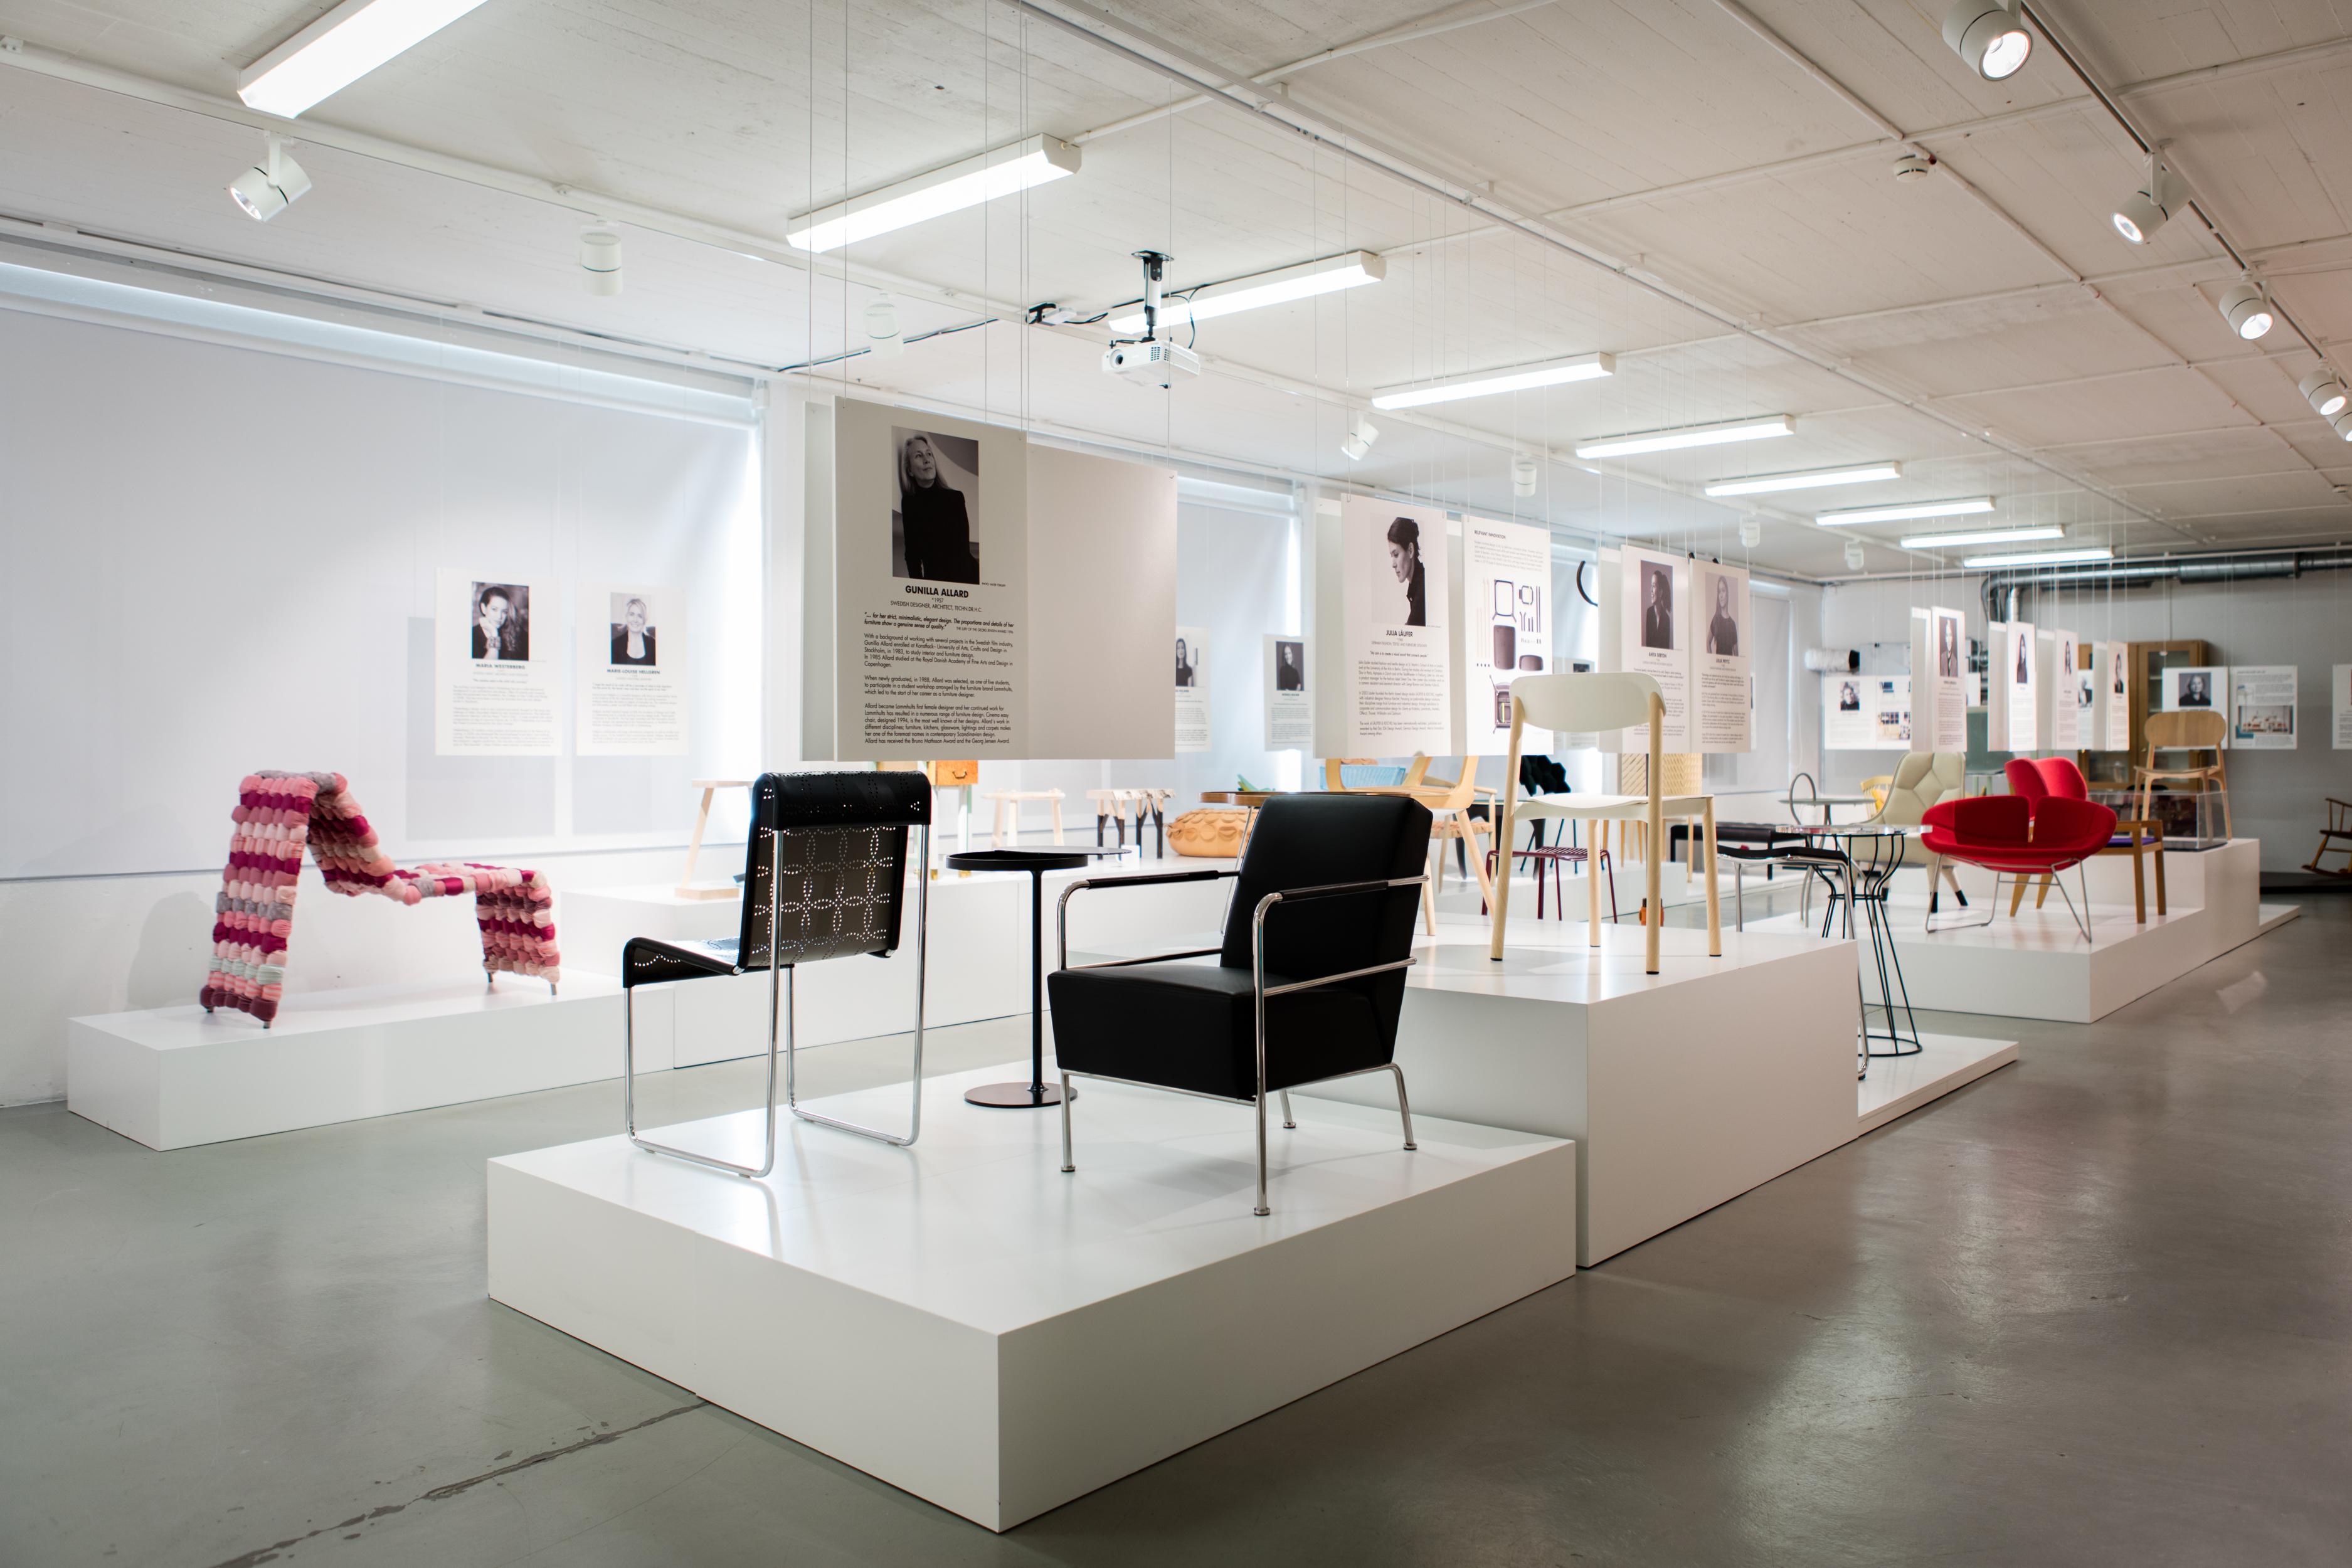 Kvinnliga Möbeldesigners Lyfts på Möbeldesignmuseum